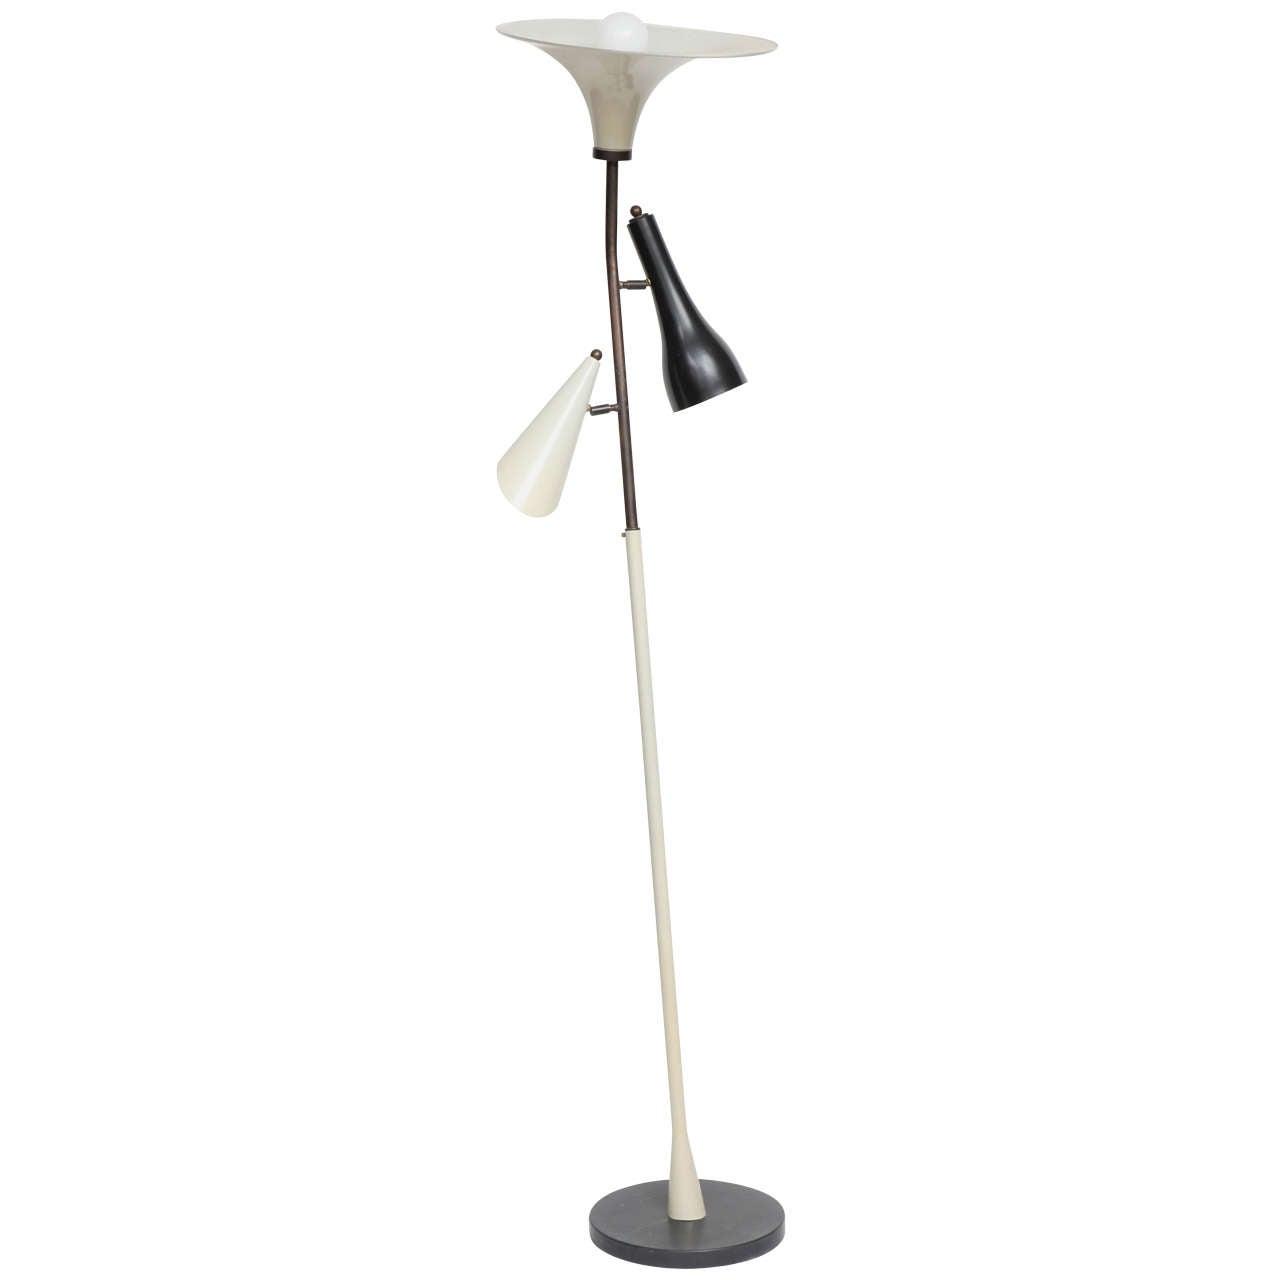 1950s Floor Lamp in the Style of Gino Sarfatti